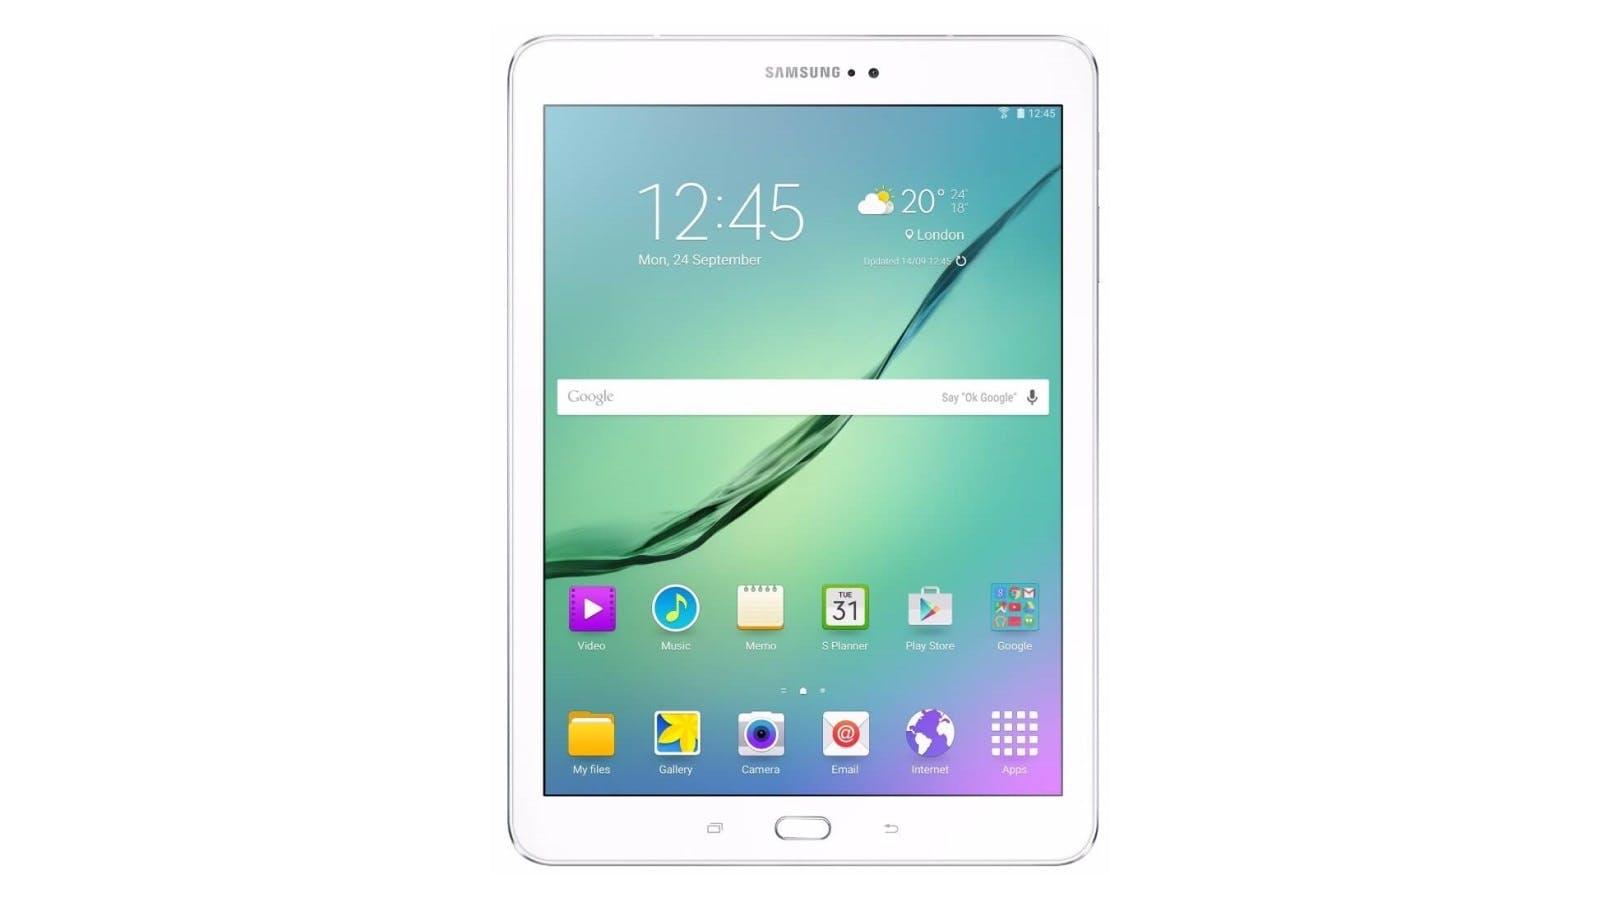 Samsung Galaxy Tab S2 97 SM T819YZWEXME 32GB